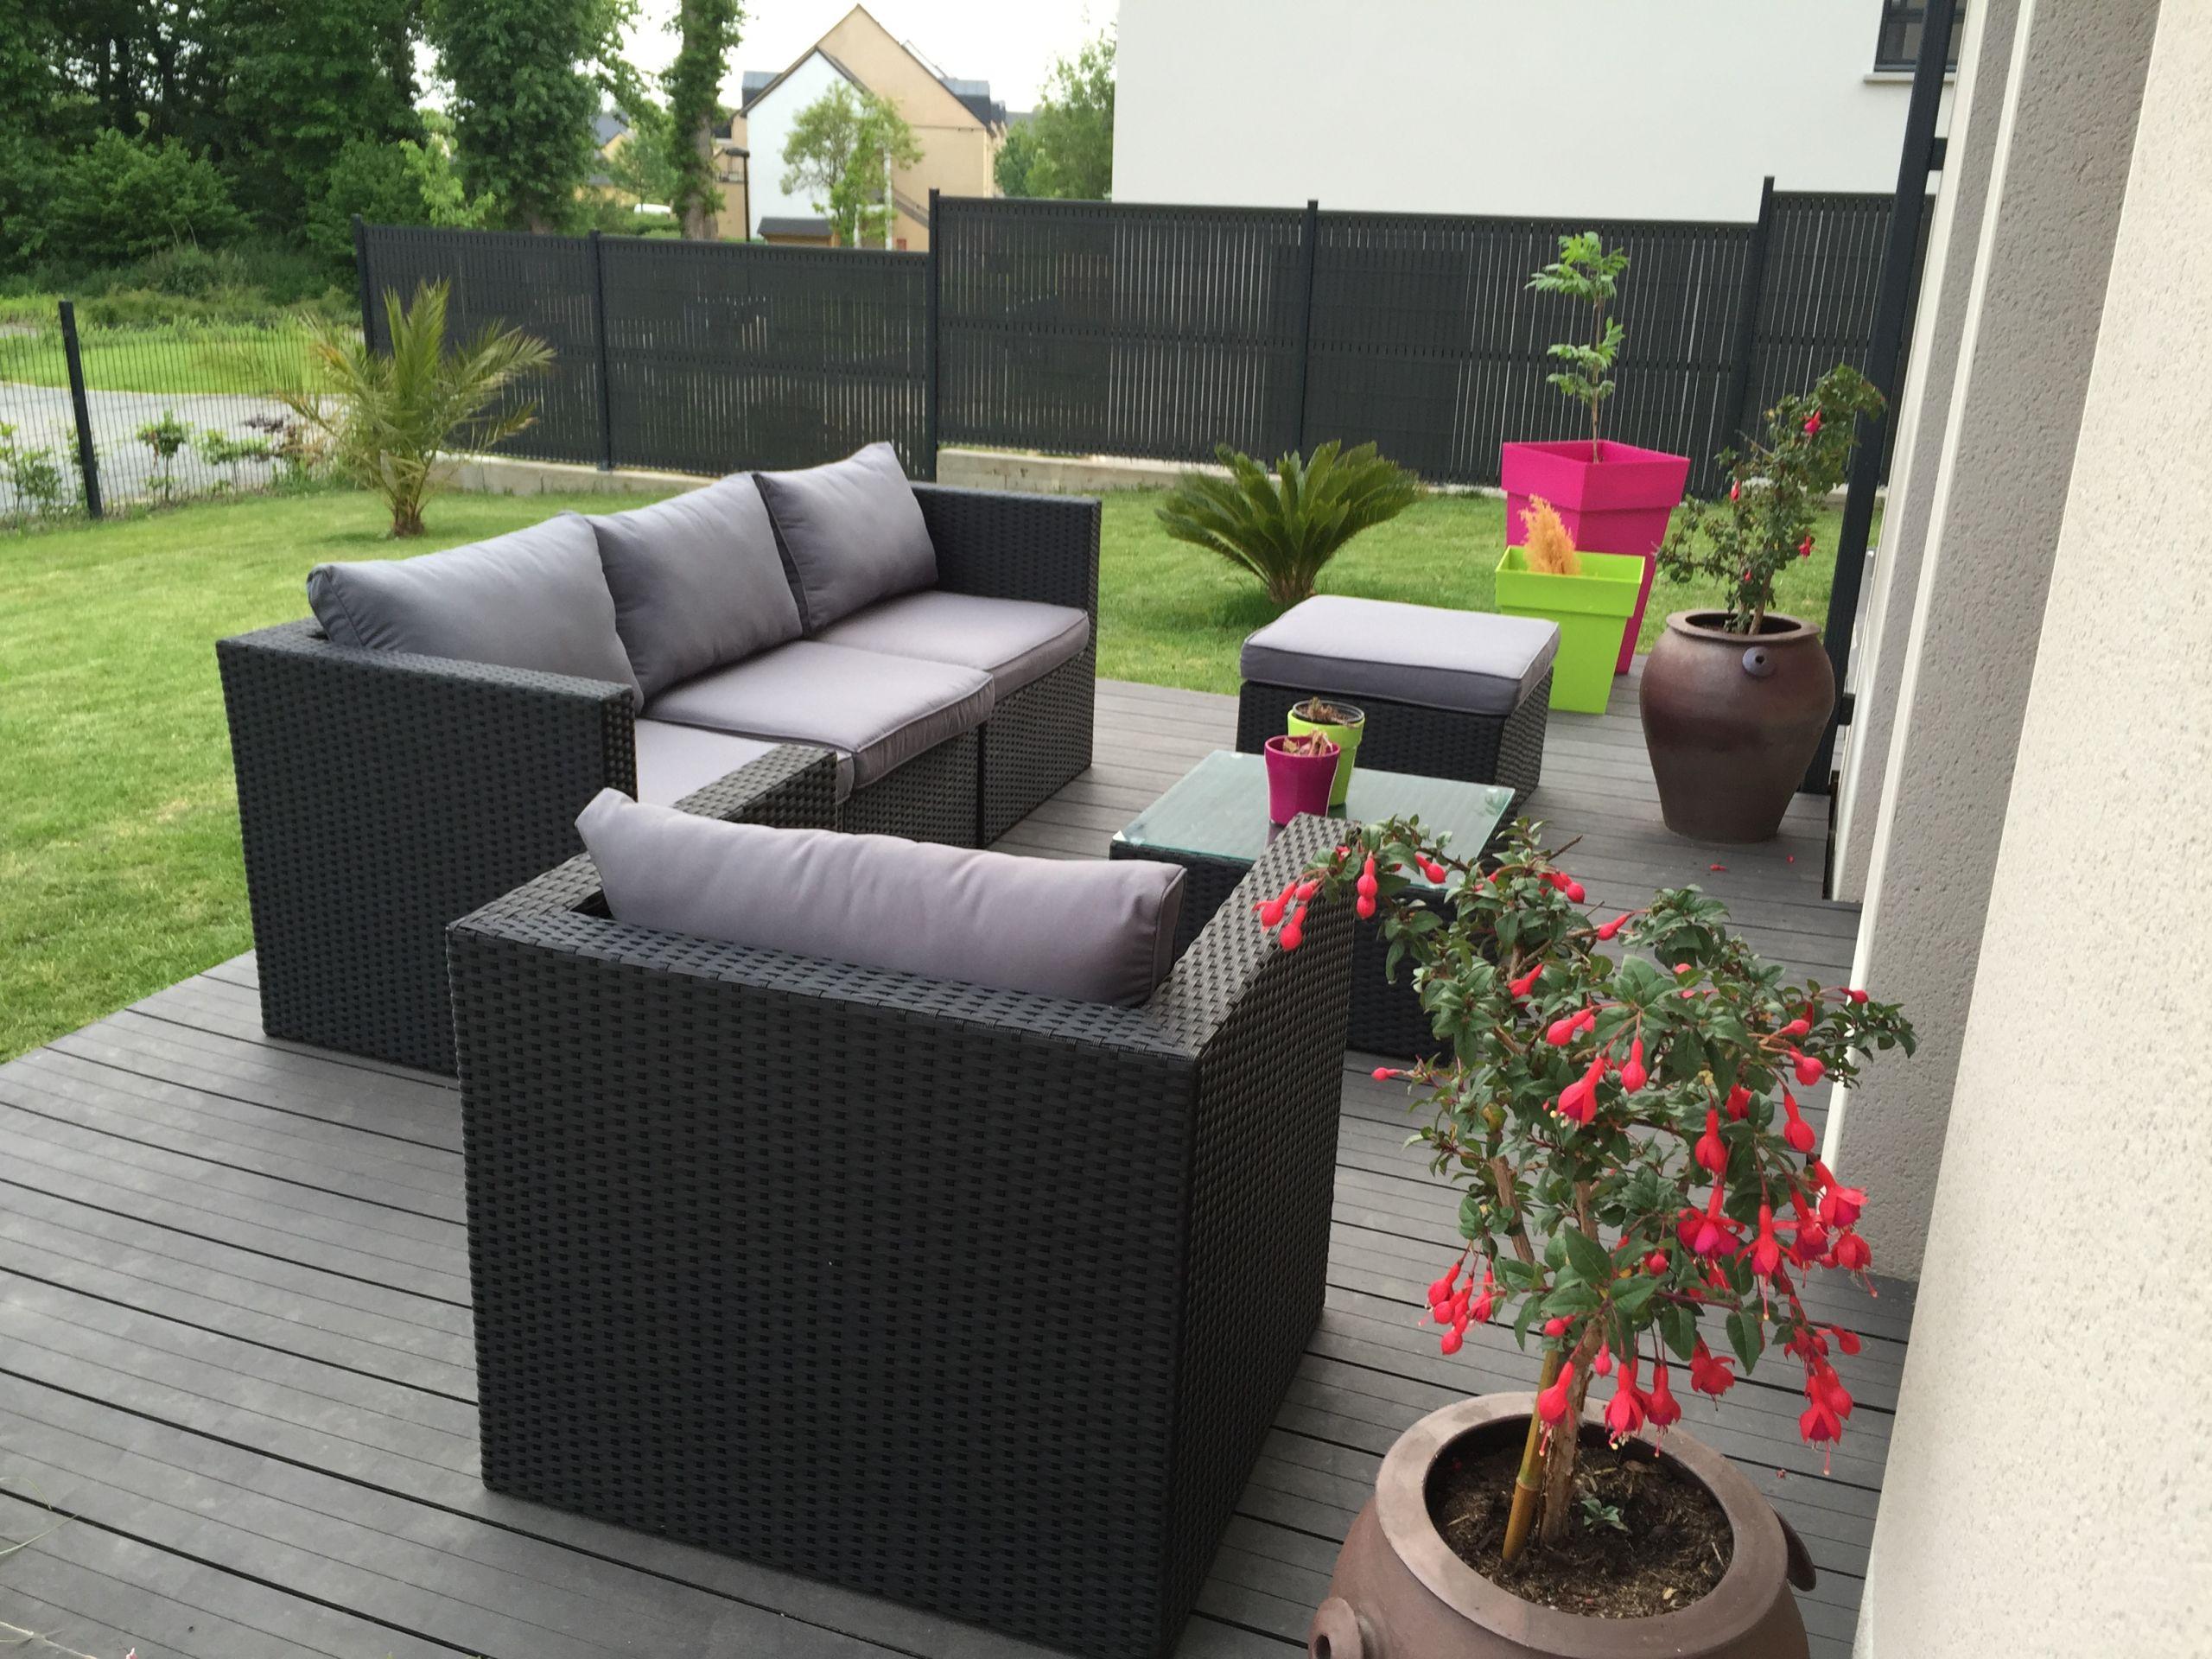 Cabane De Jardin En Palette Luxe Salon De Jardin Ikea 2018 the Best Undercut Ponytail